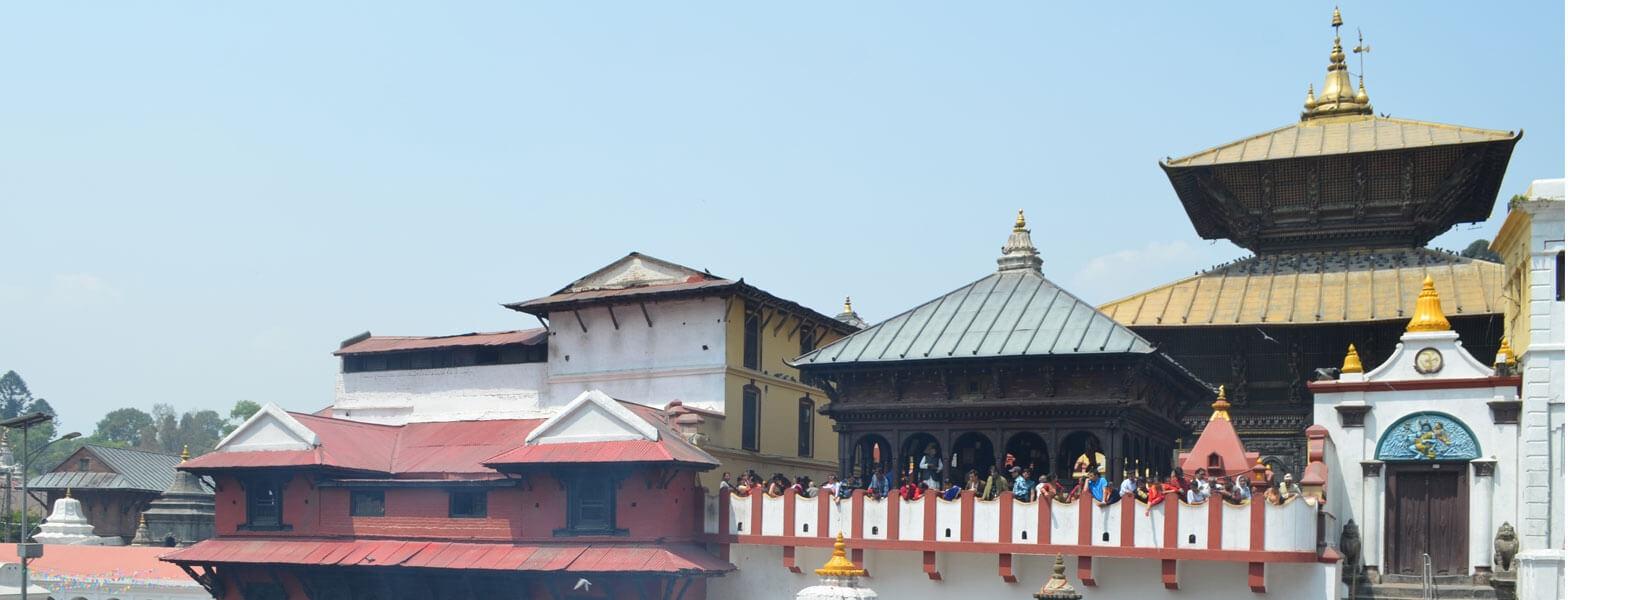 World Heritage Zones | 3 Cities (Patan/Bhaktapur/Kathmandu)